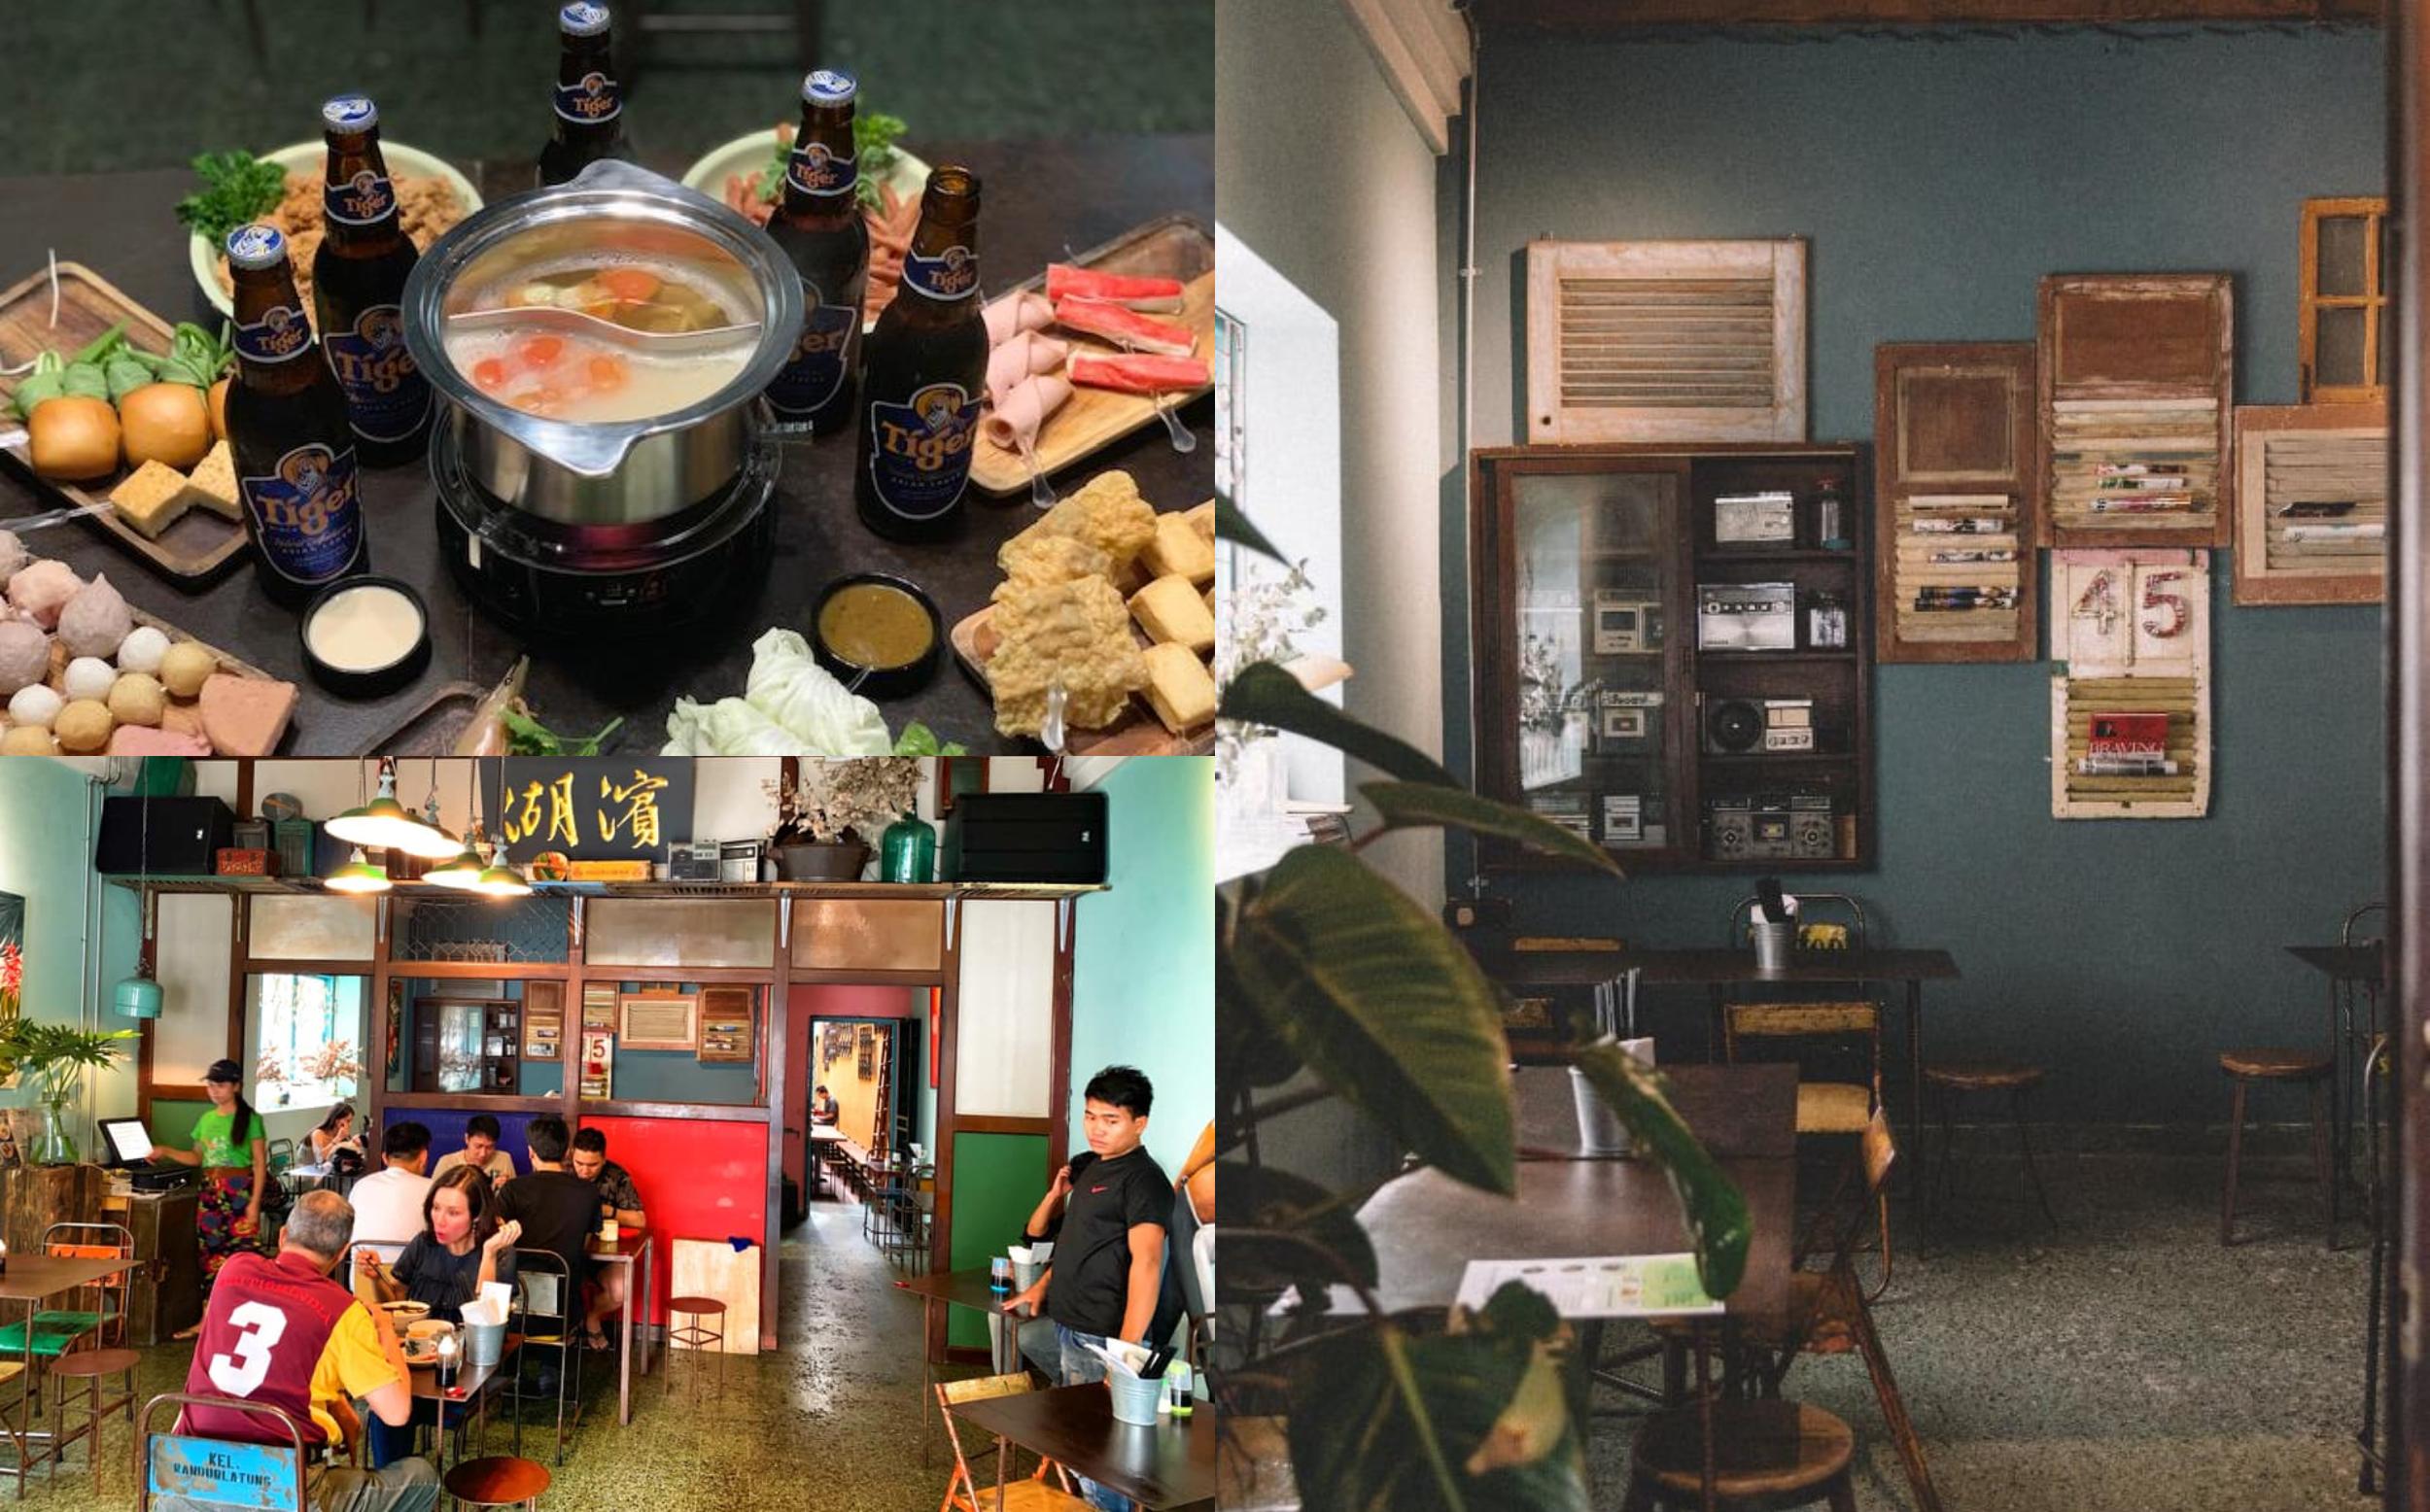 45 Speak Vezy Bar除了售卖鸡尾酒、啤酒及红酒外,最大的特点是有卖火锅。